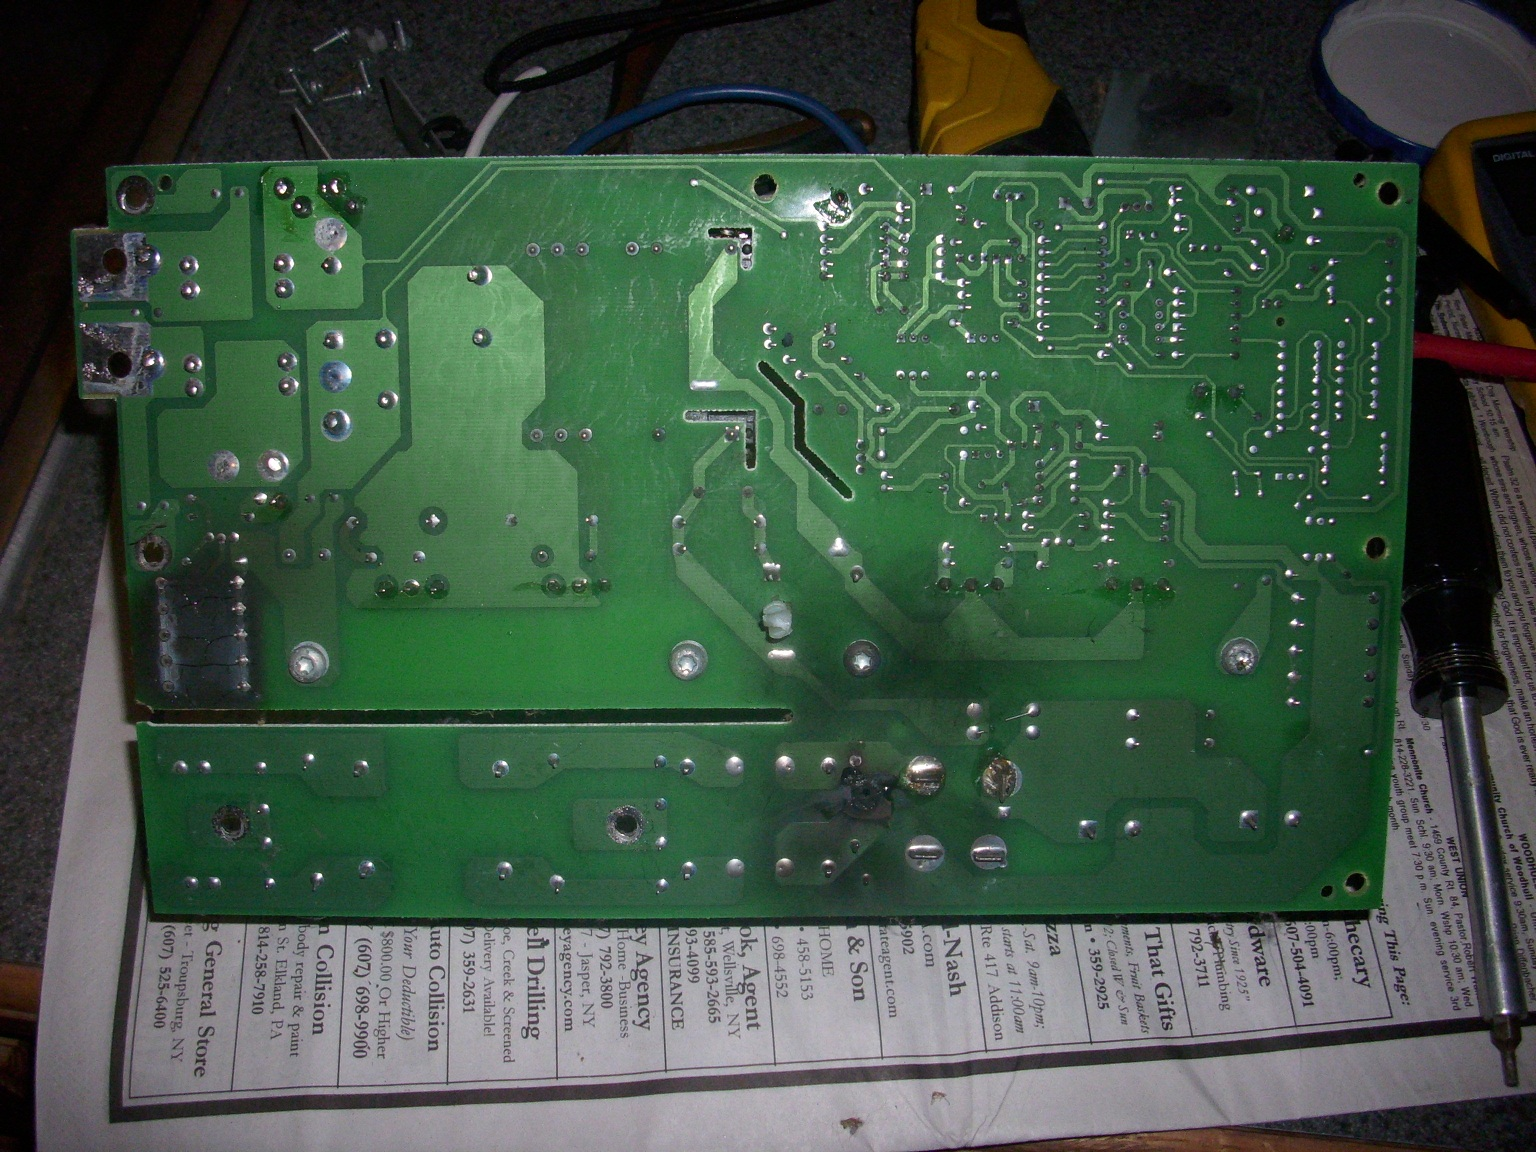 Steves Fix It Shop: Parallax 7345 RV Power Converter (SMPS)